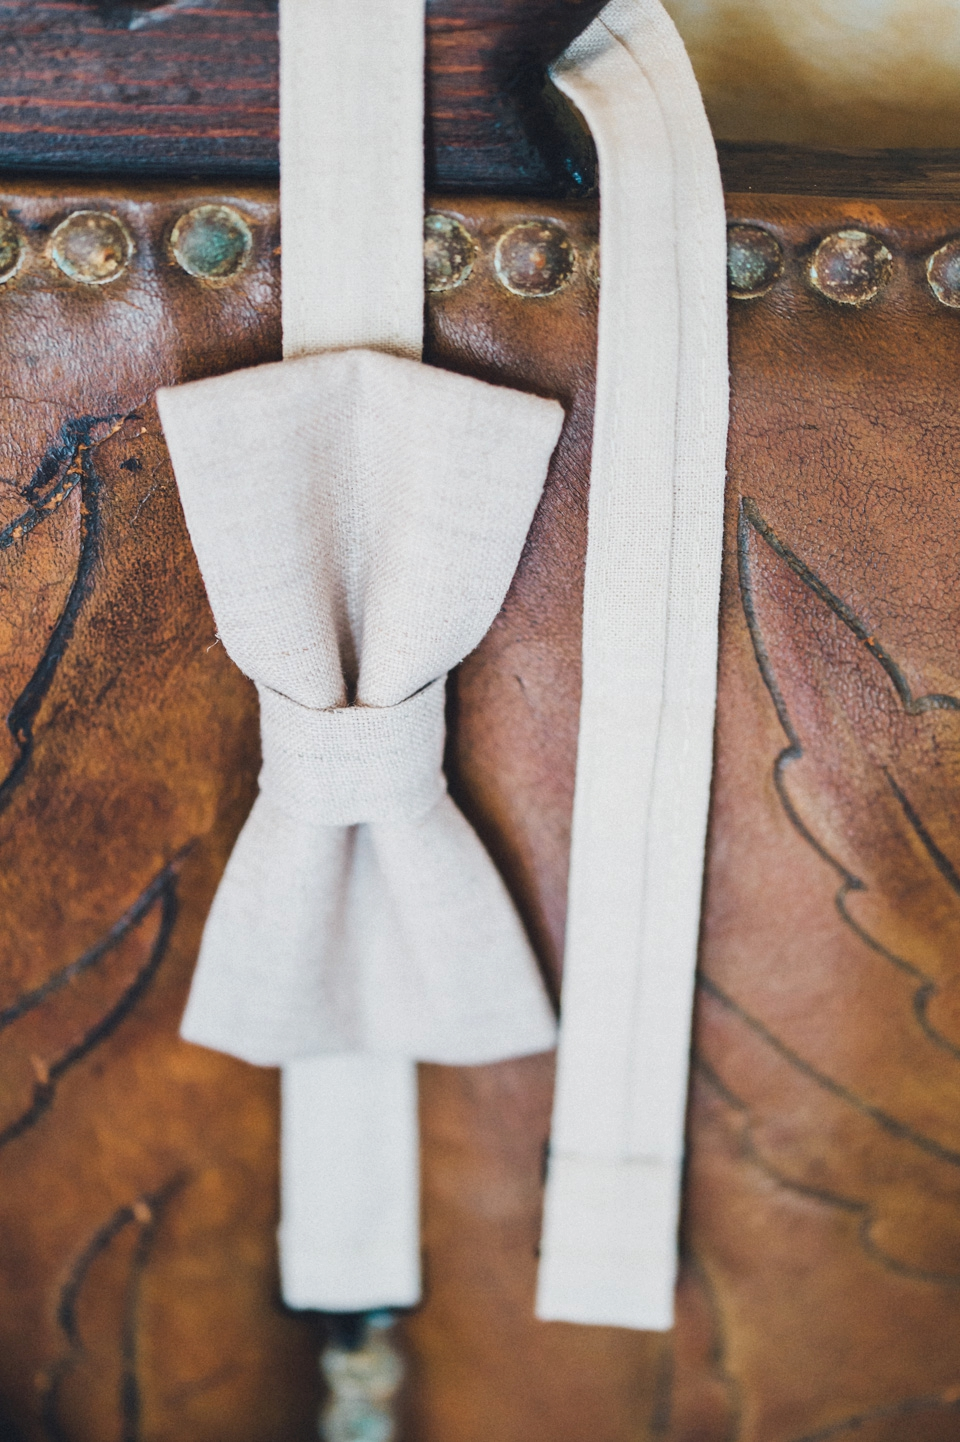 bohemian-ibiza-kreativ-wedding_0016 hochzeitsfotograf hochzeitsvideo ibiza bohemian weddingSaskia & Pierre Bohemian Bohemian Ibiza Weddingbohemian ibiza kreativ wedding 0016